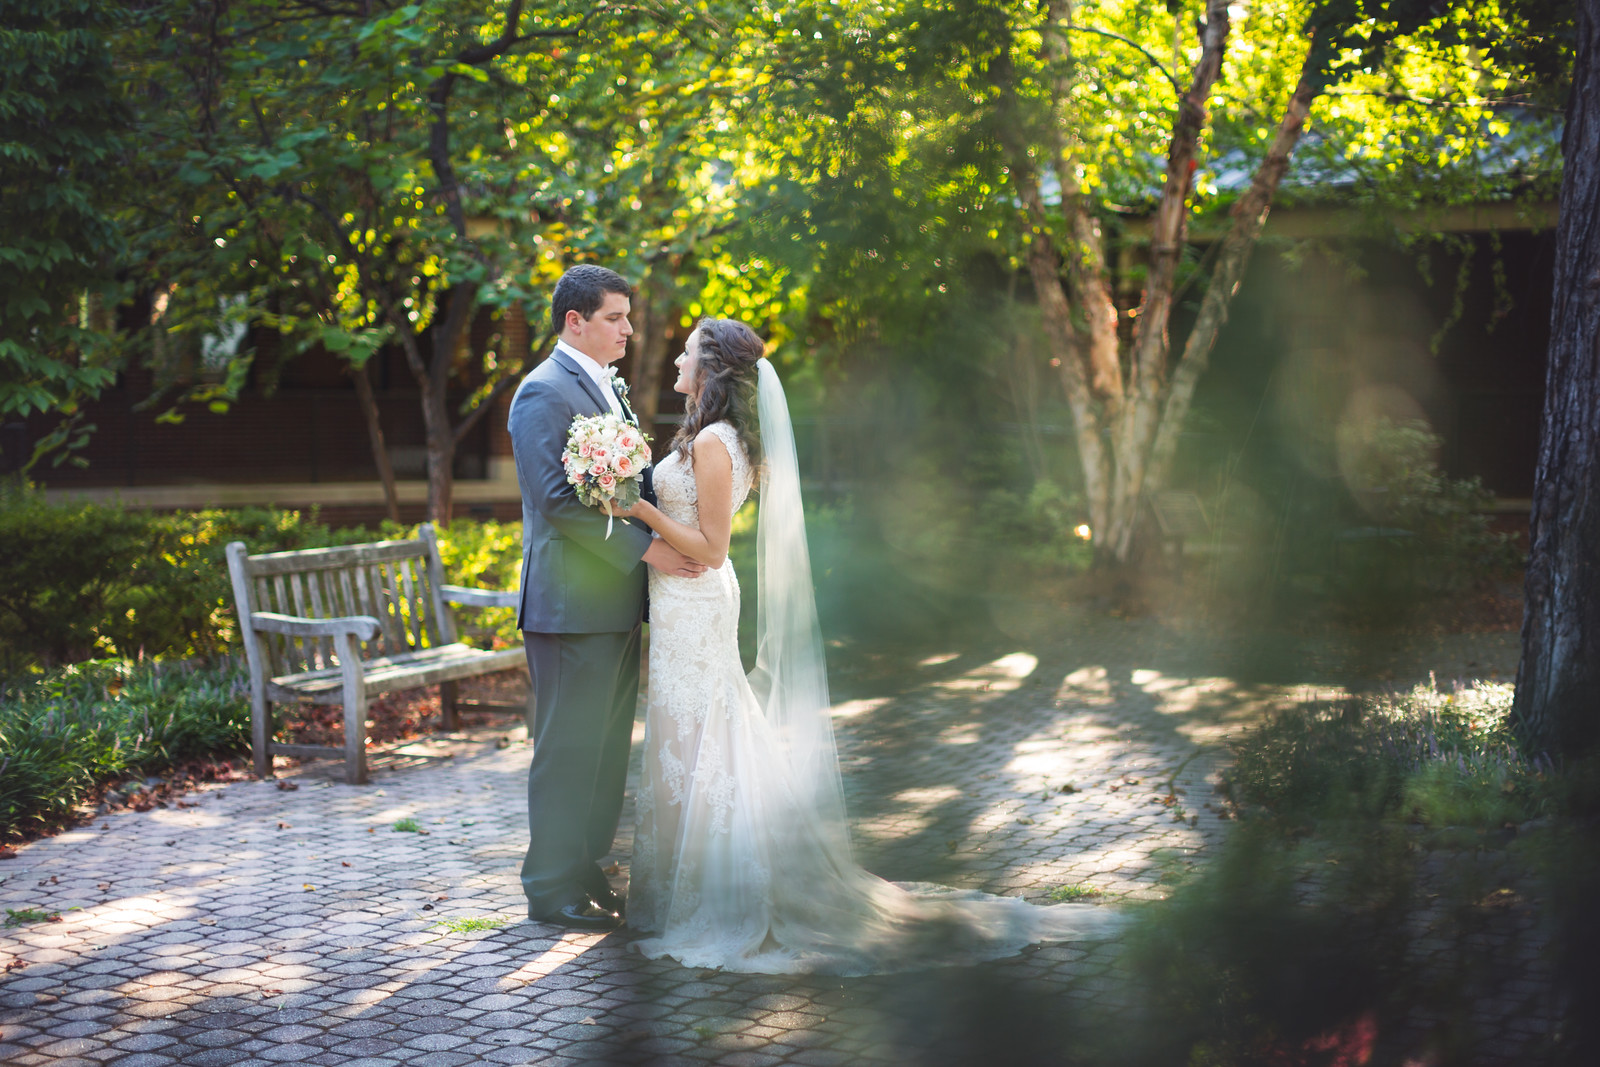 449_Harrison+Merritt_Wedding-X3-1.jpg